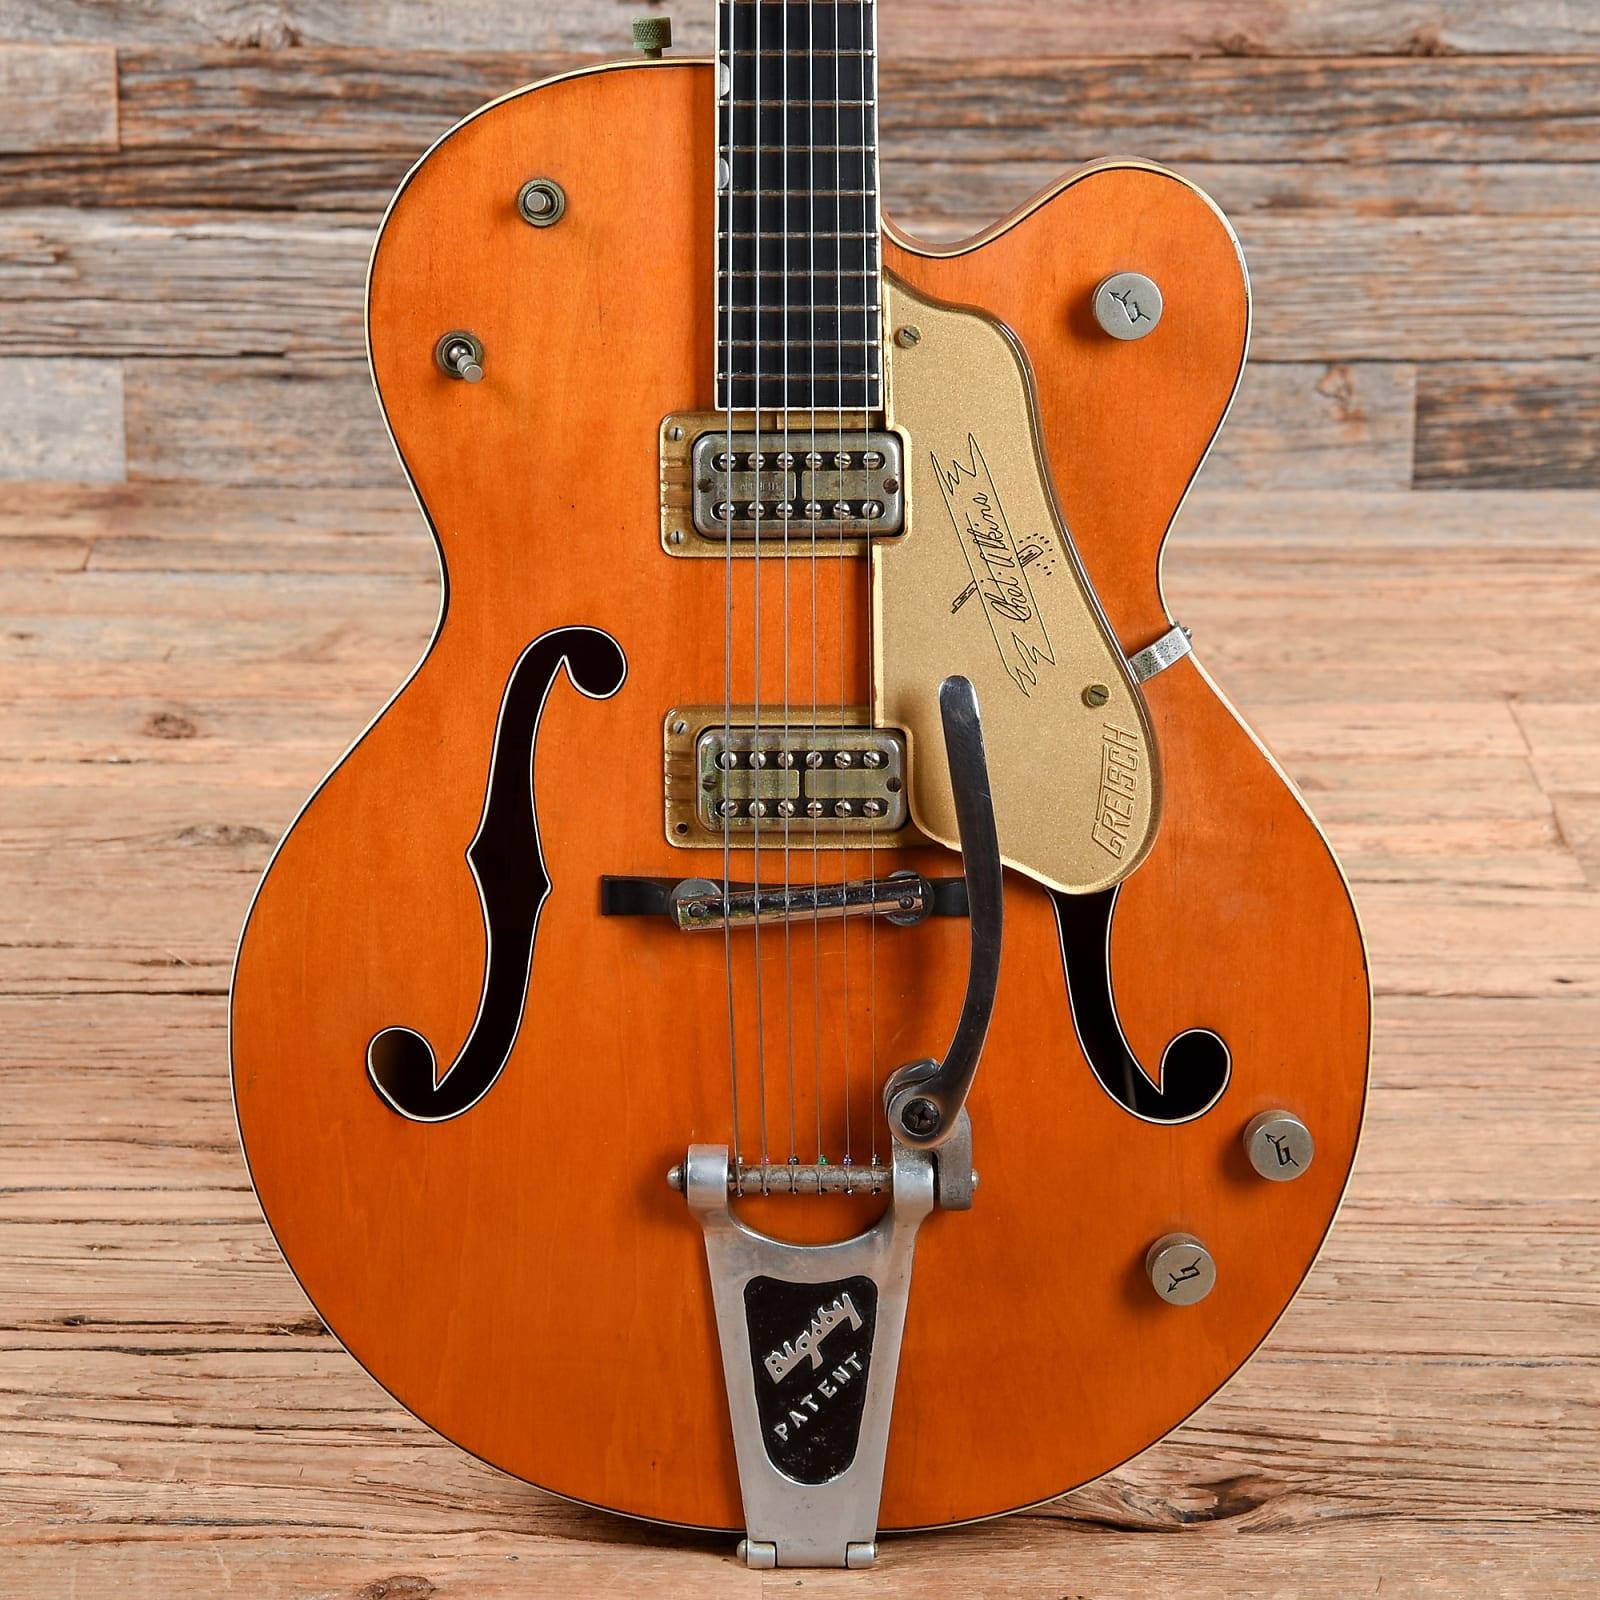 Gretsch 6120 Chet Atkins Hollowbody Orange 1958